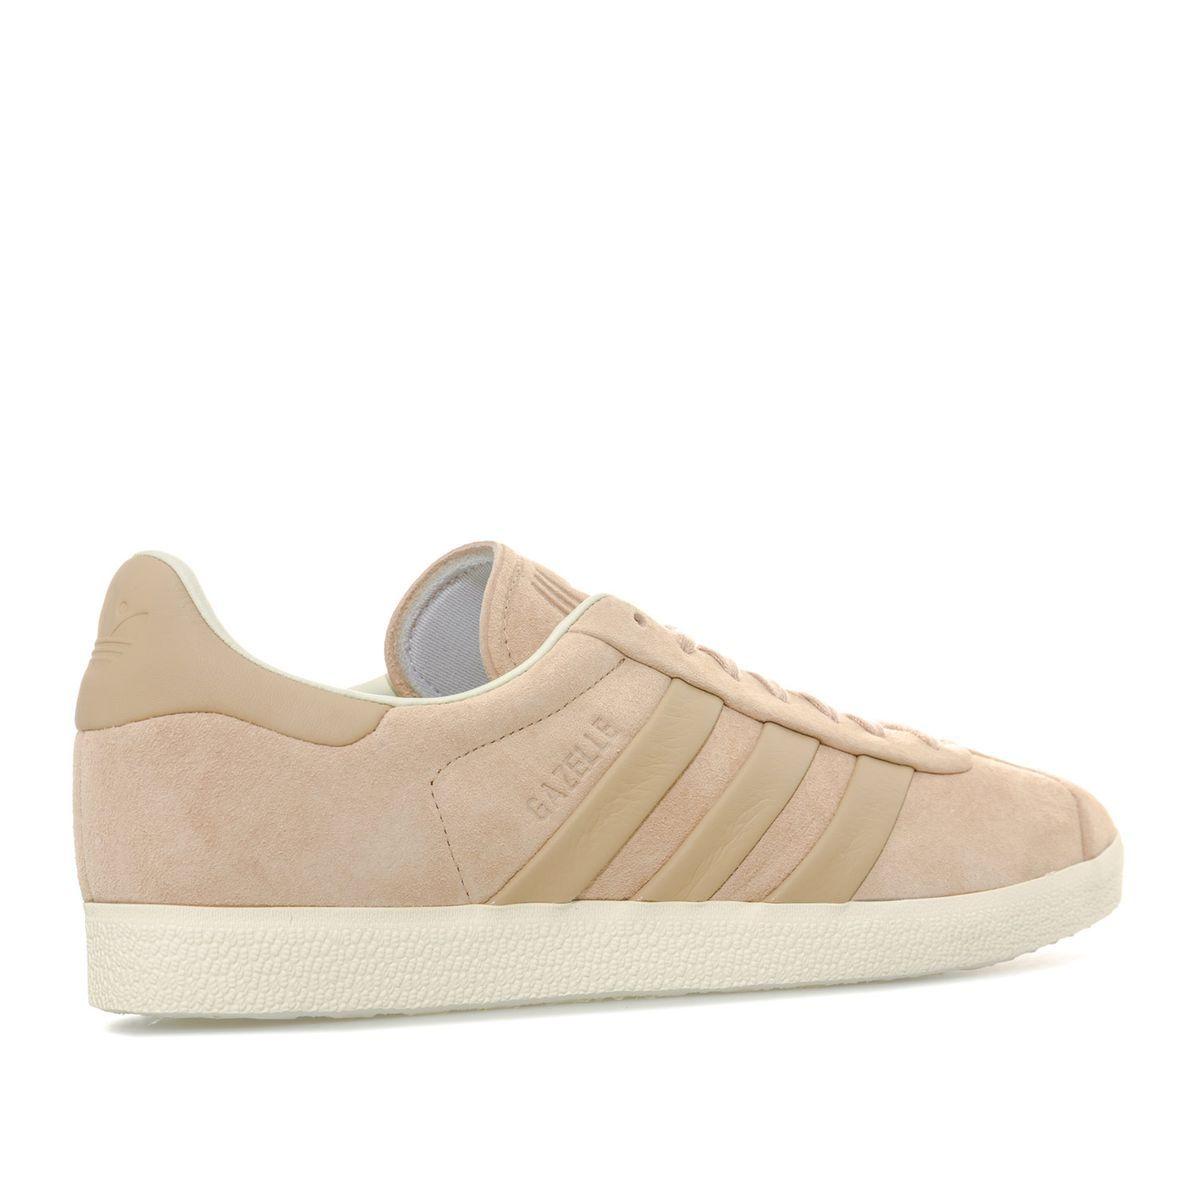 Baskets Gazelle Stitch-and-turn - Taille : 43 1/3 | Chaussure ado ...